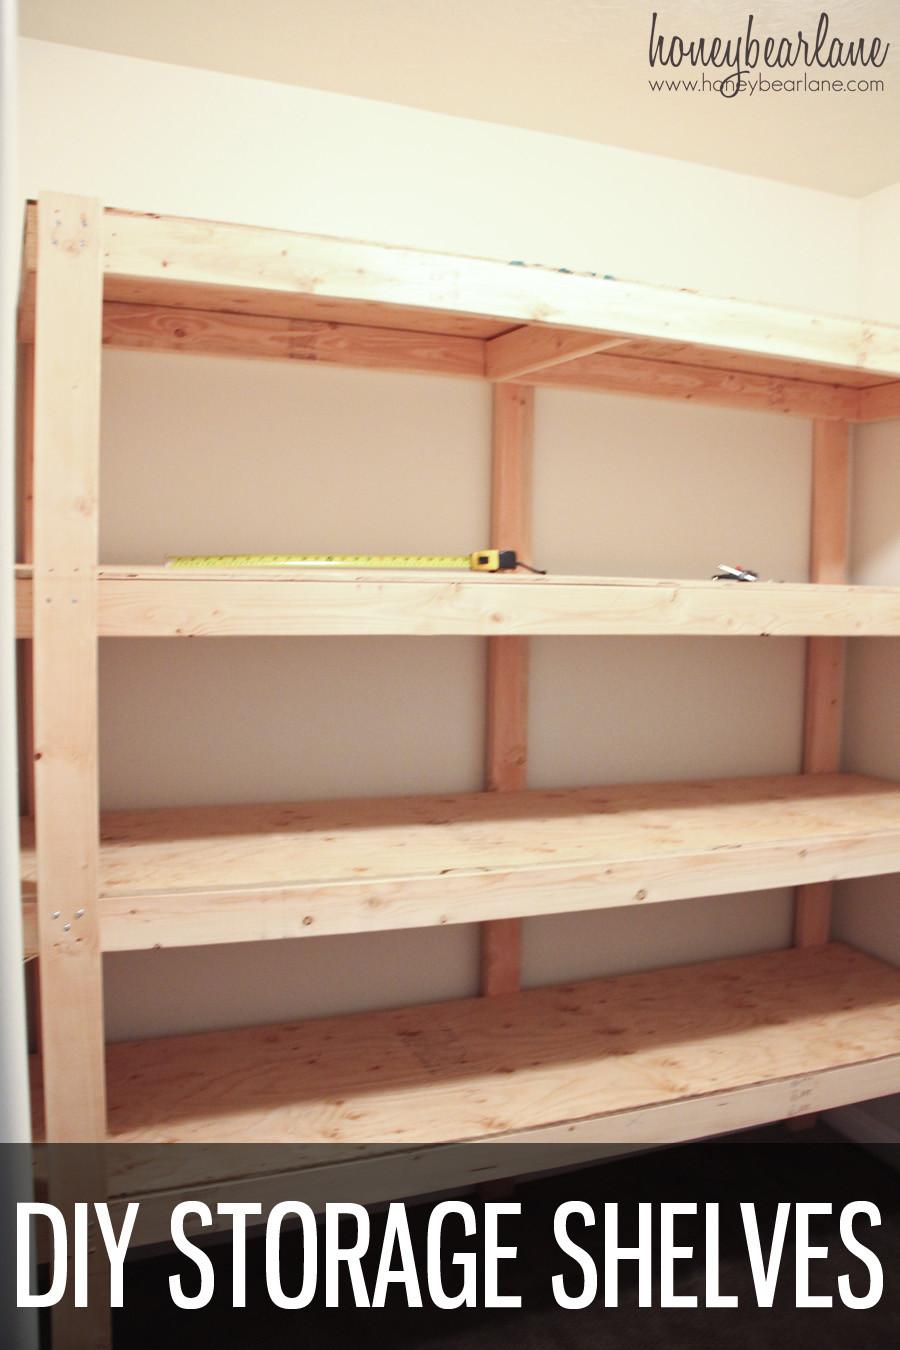 Best ideas about DIY Shelf Organizer . Save or Pin DIY Storage Shelves Honeybear Lane Now.